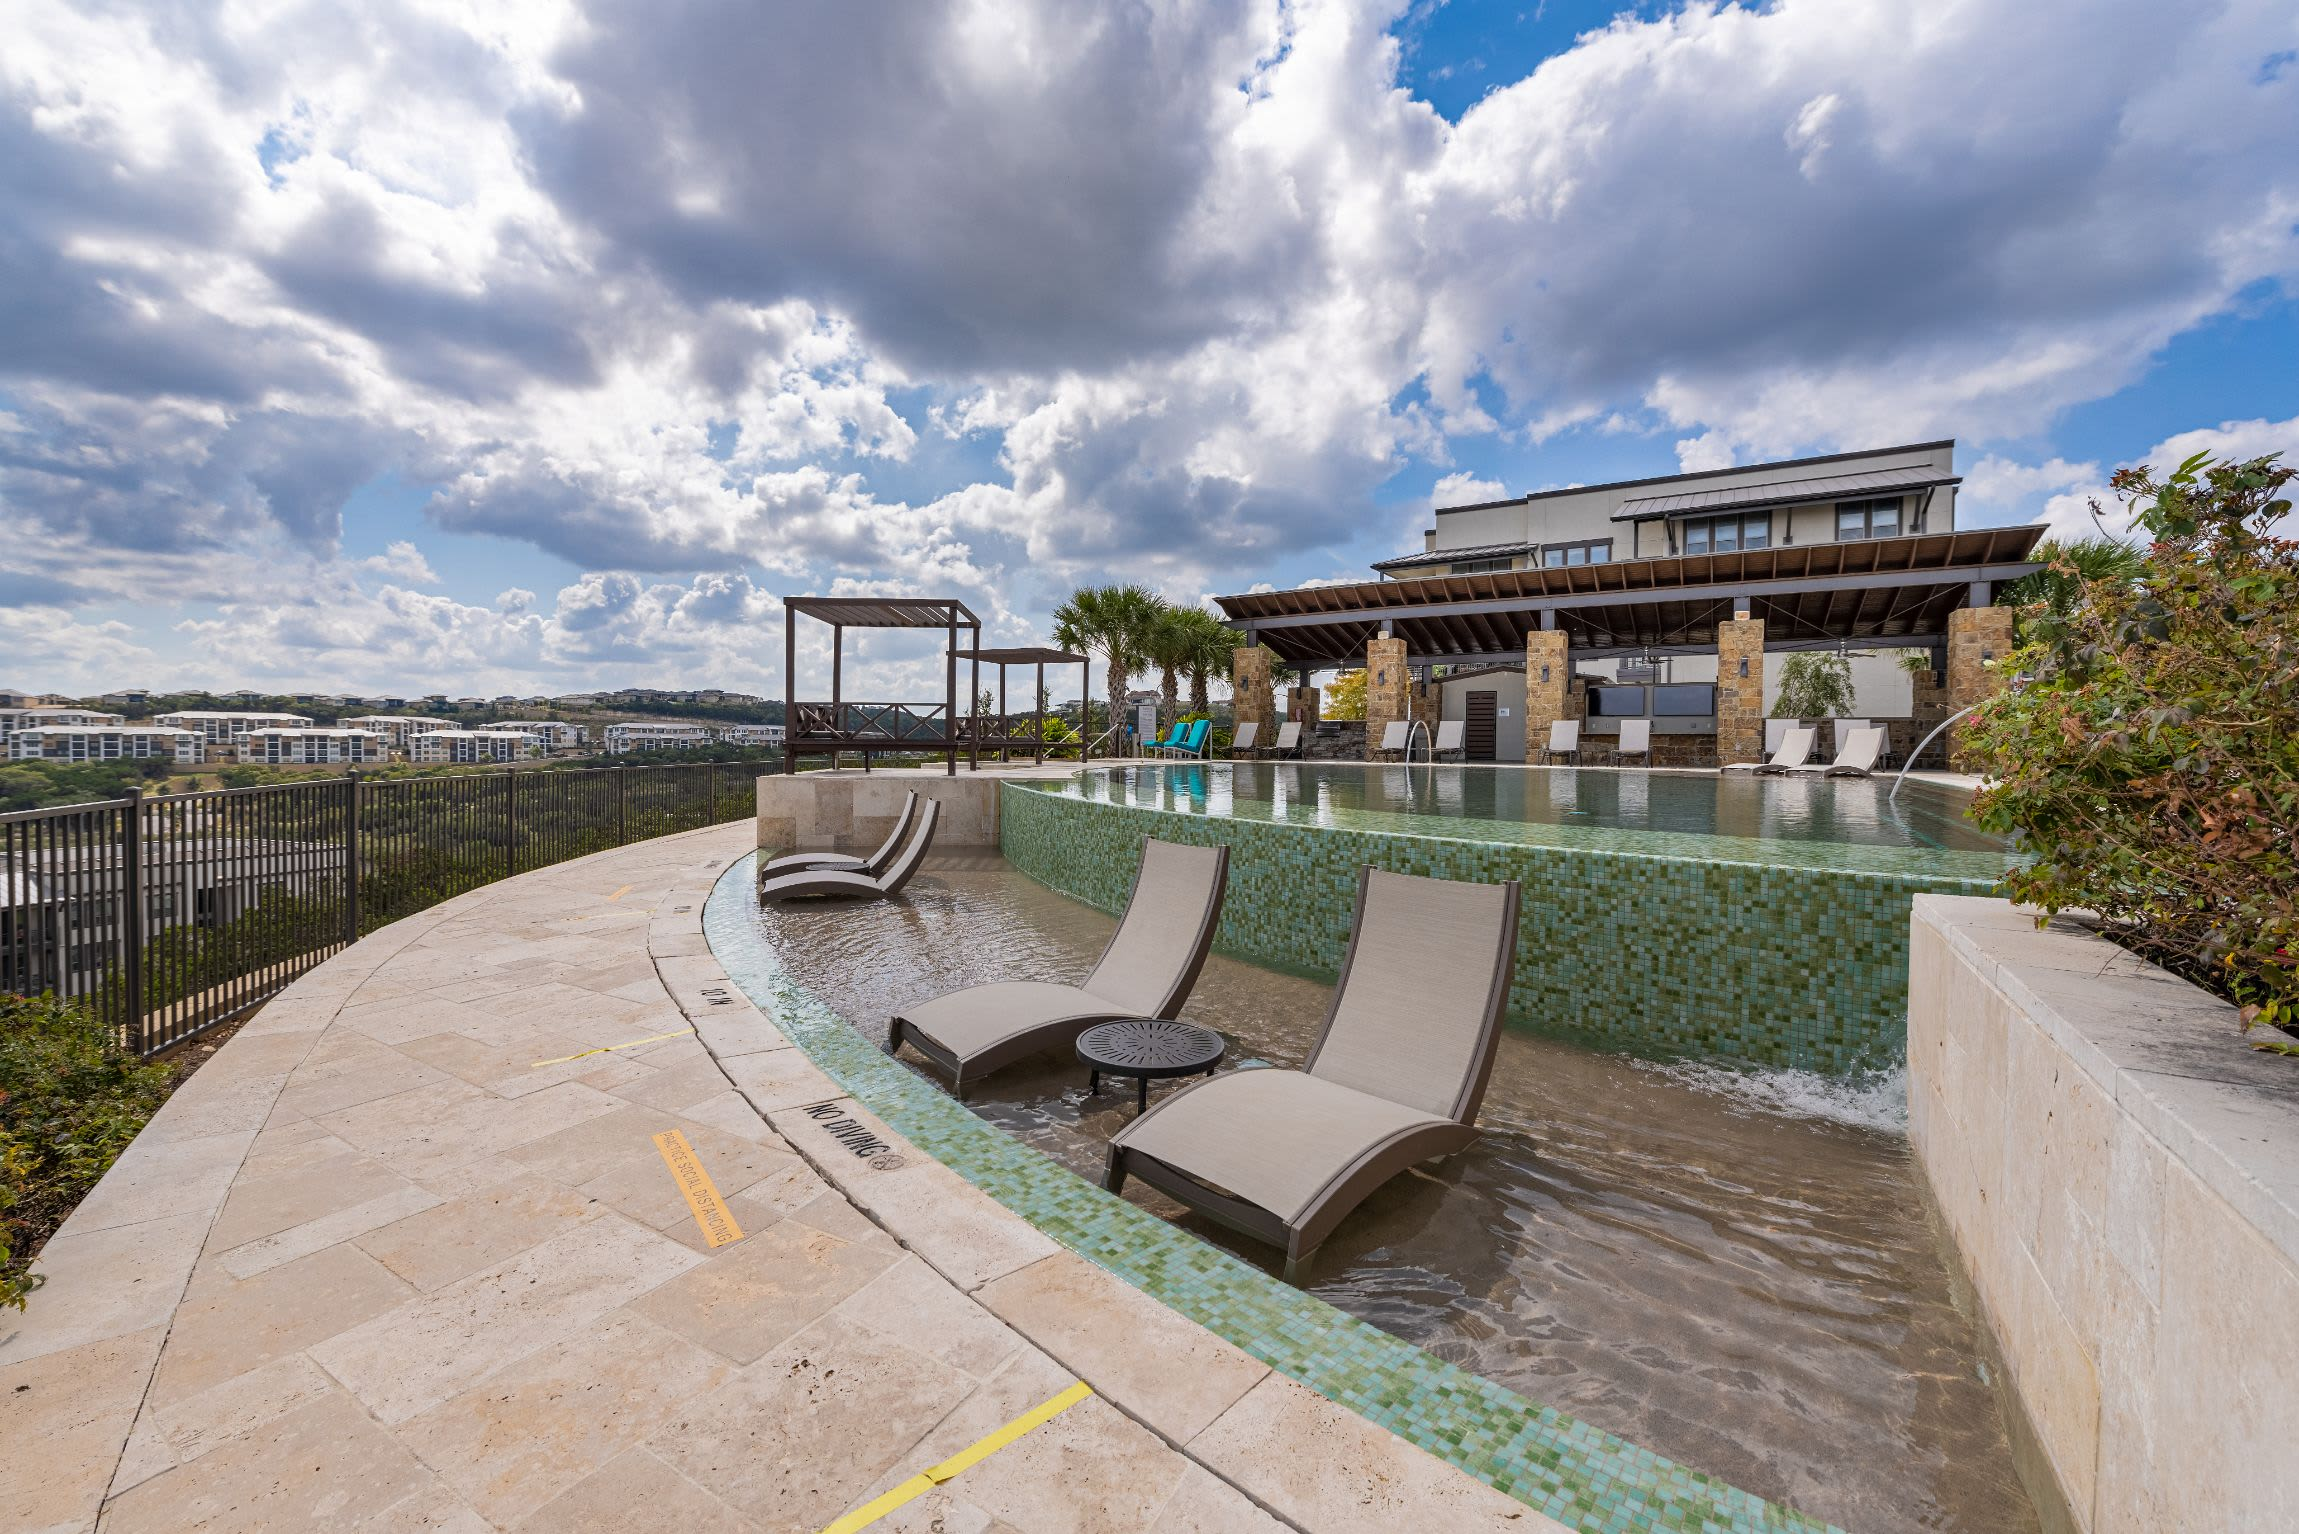 Sun chairs in swimming pool at Marquis Cresta Bella in San Antonio, Texas